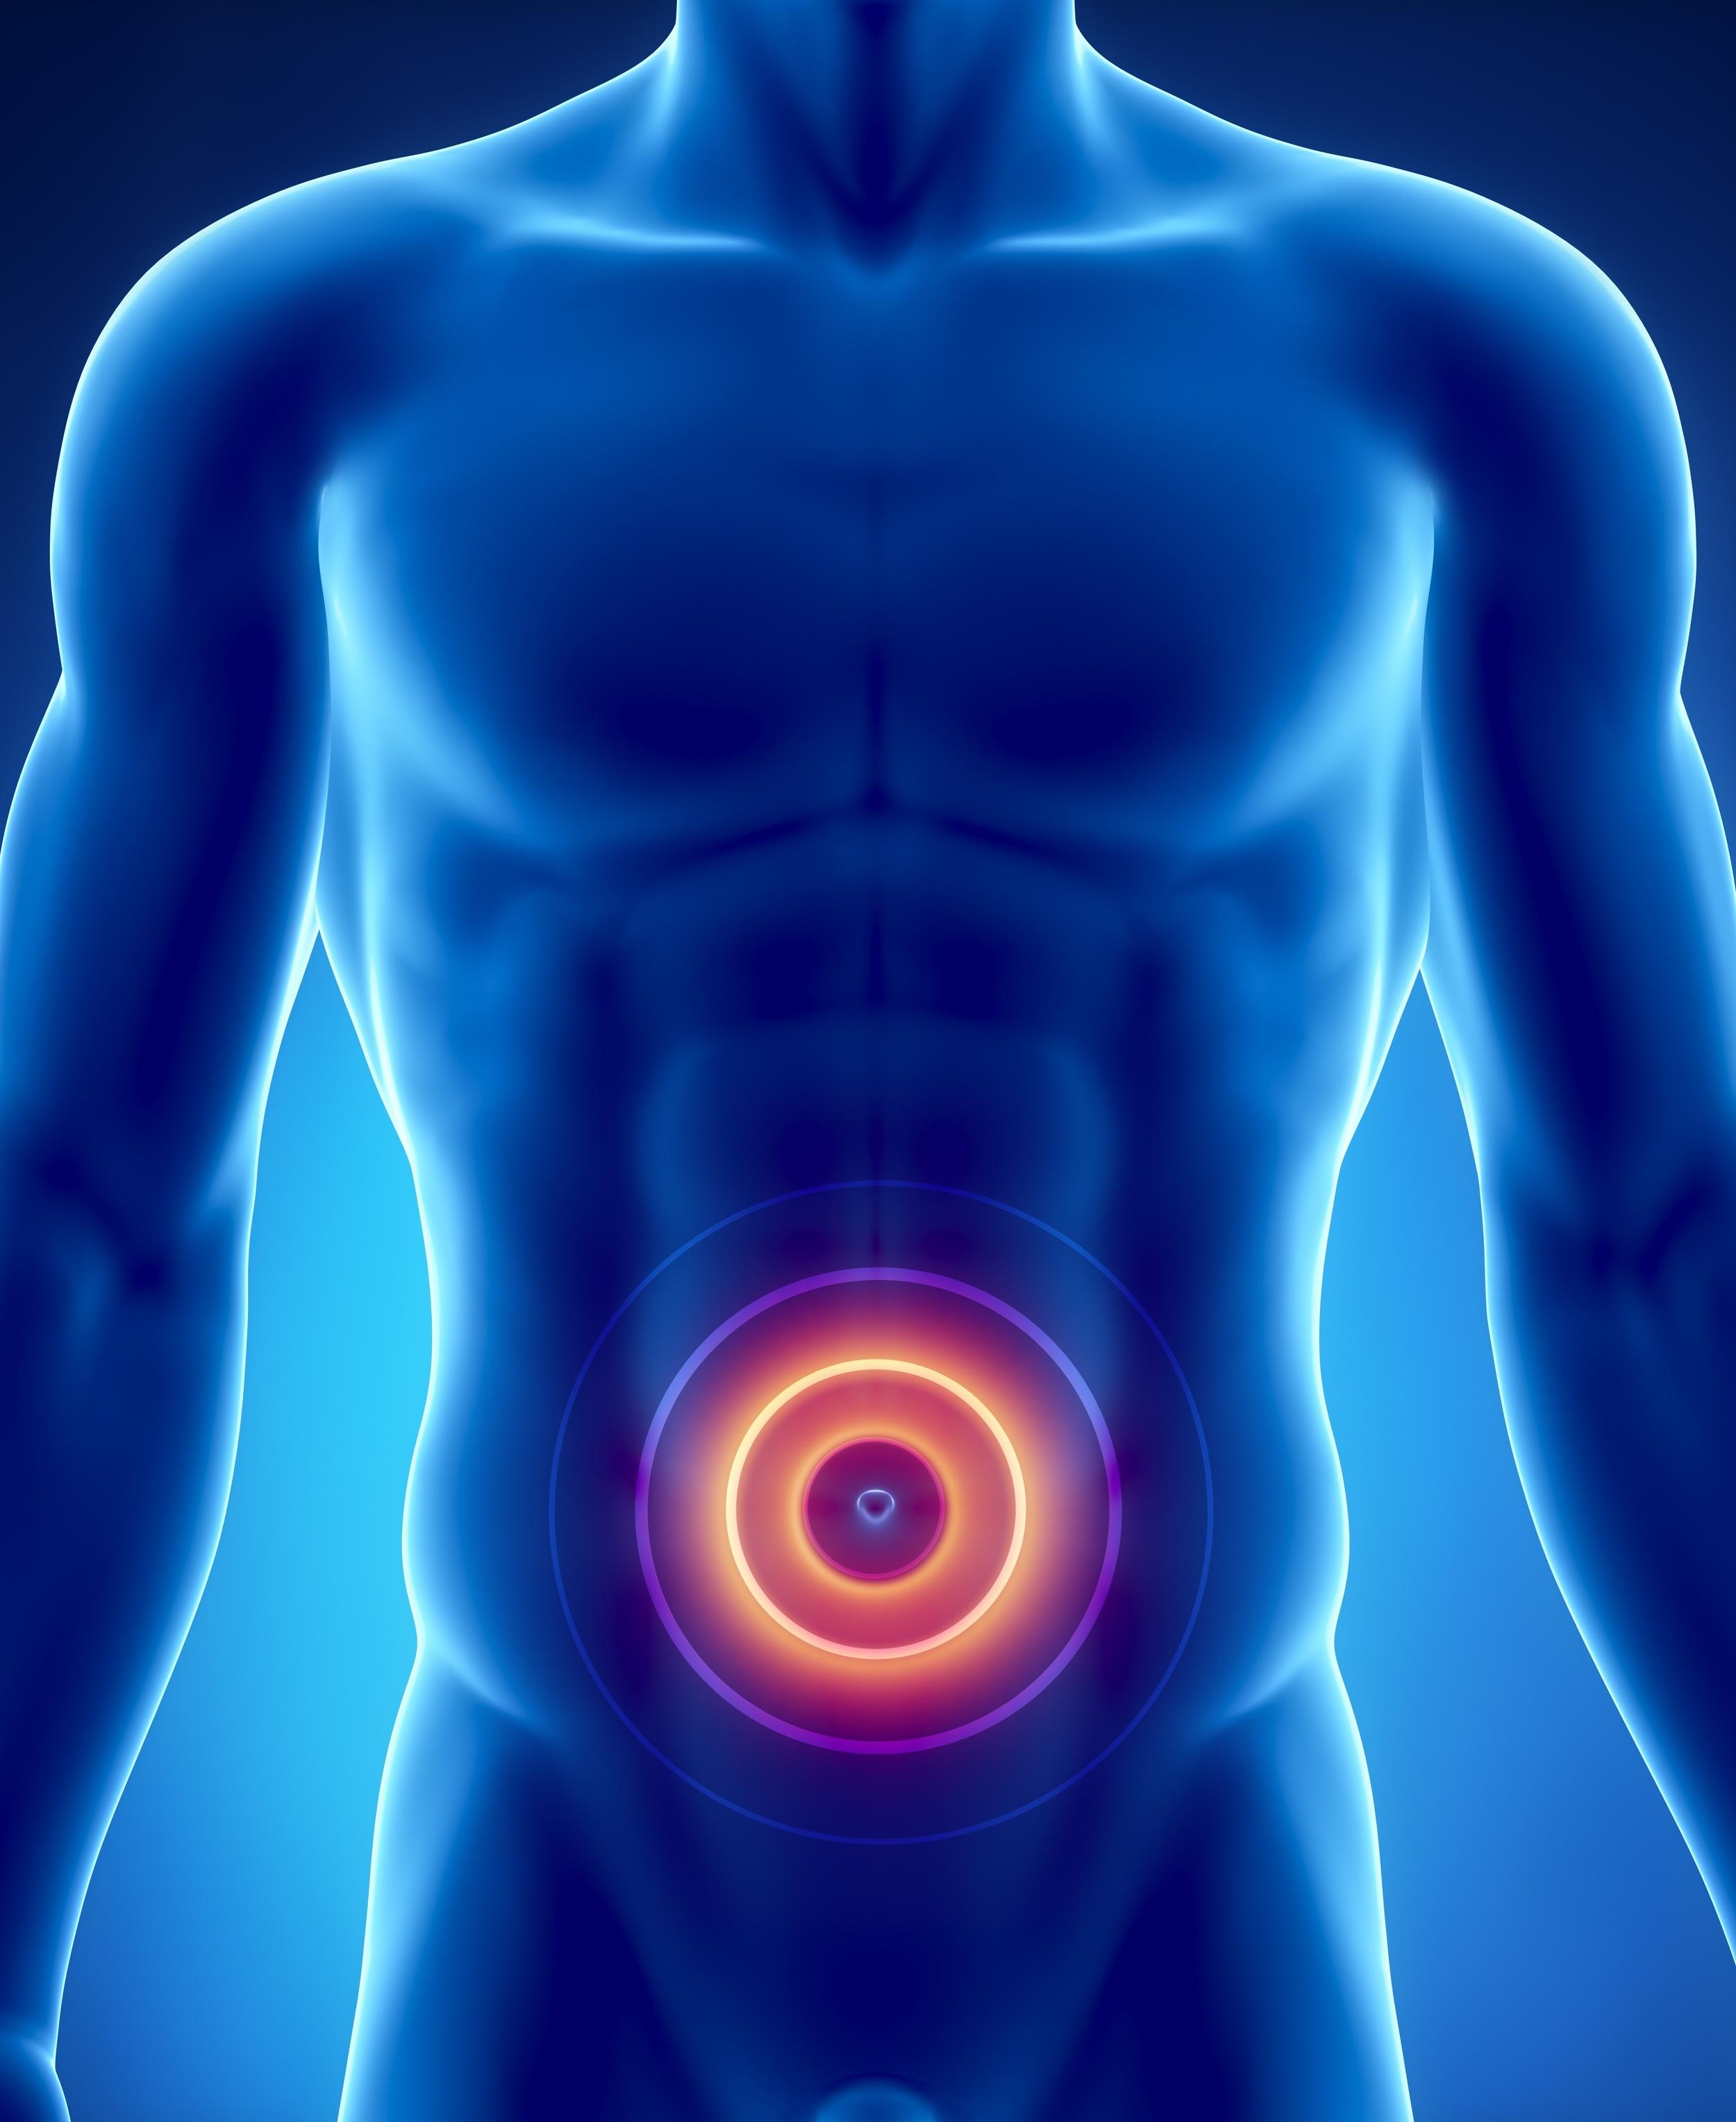 Digestive & Stomach Problems